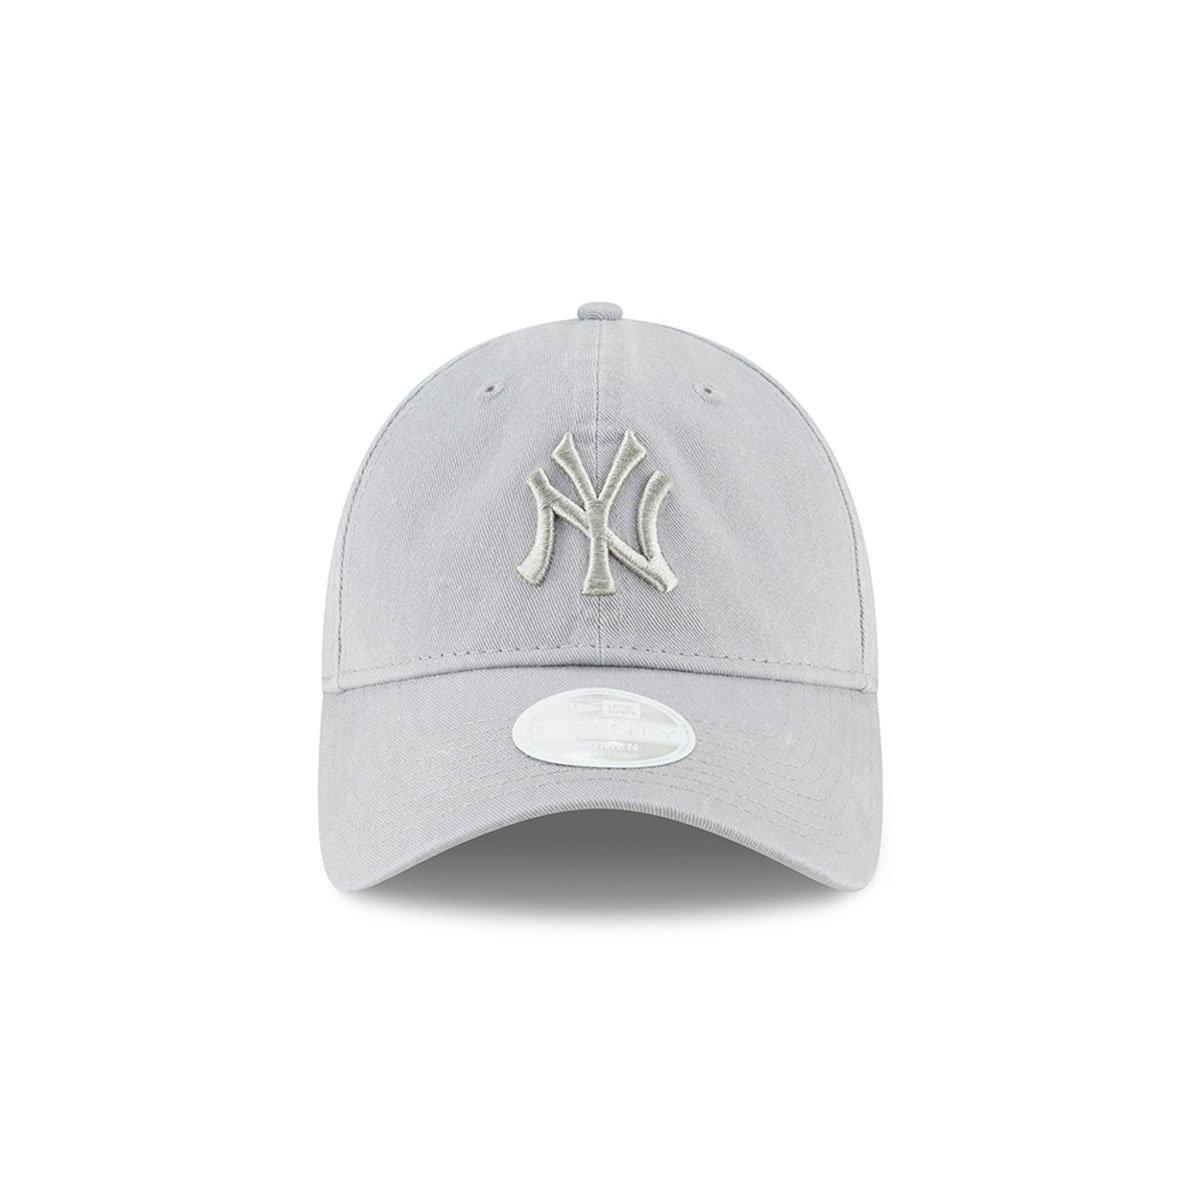 Gorra Ny Yankees New Era - Dama. SKU   91087873 Marca  NEW ERA 8ce804425468